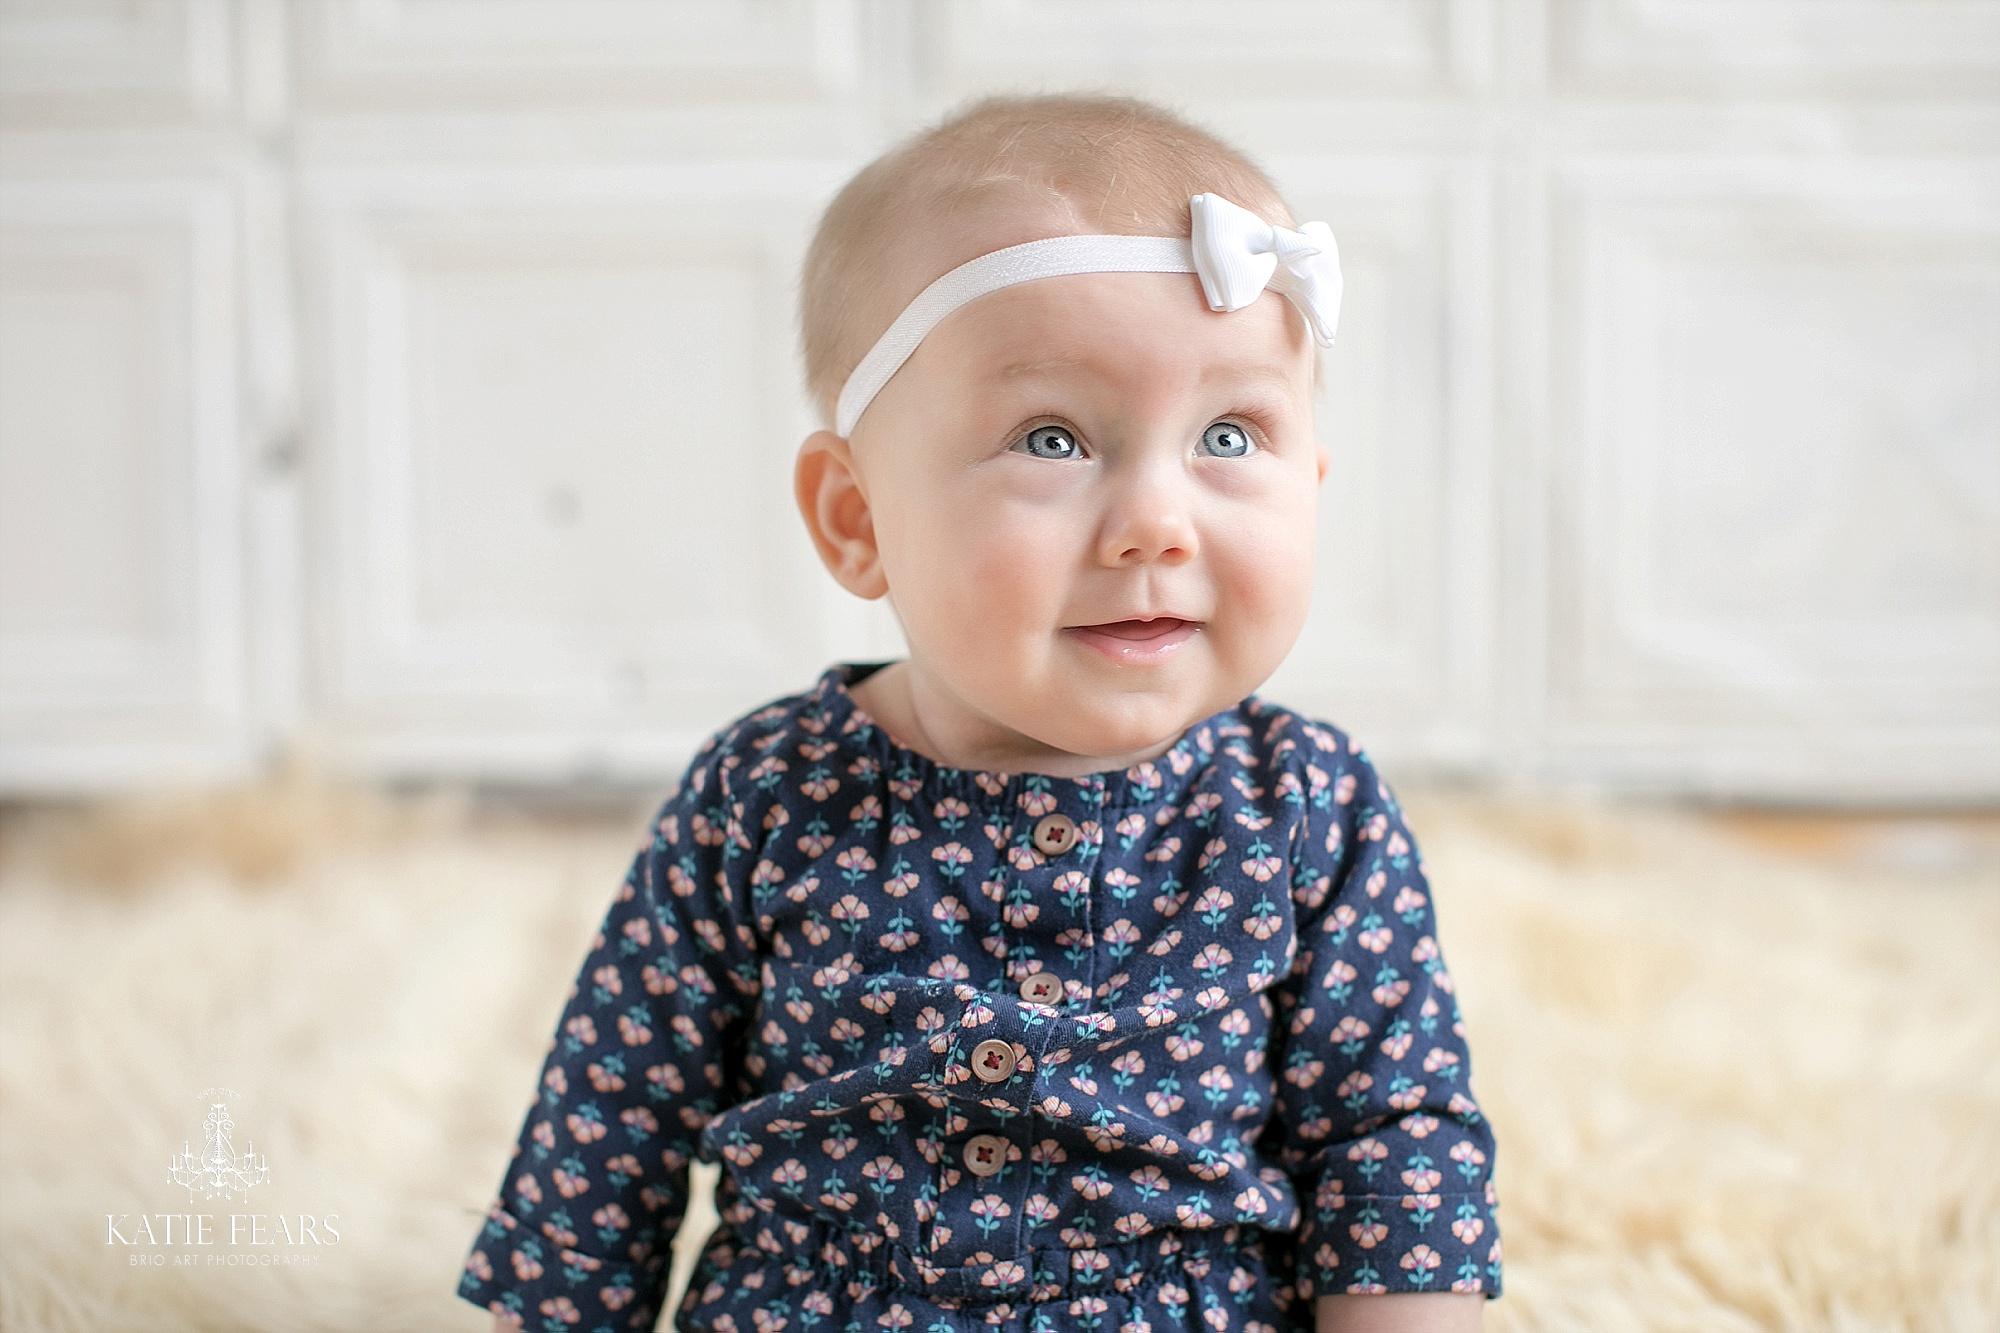 Best MN Childrens Photographer Katie Fears | www.brioart.com